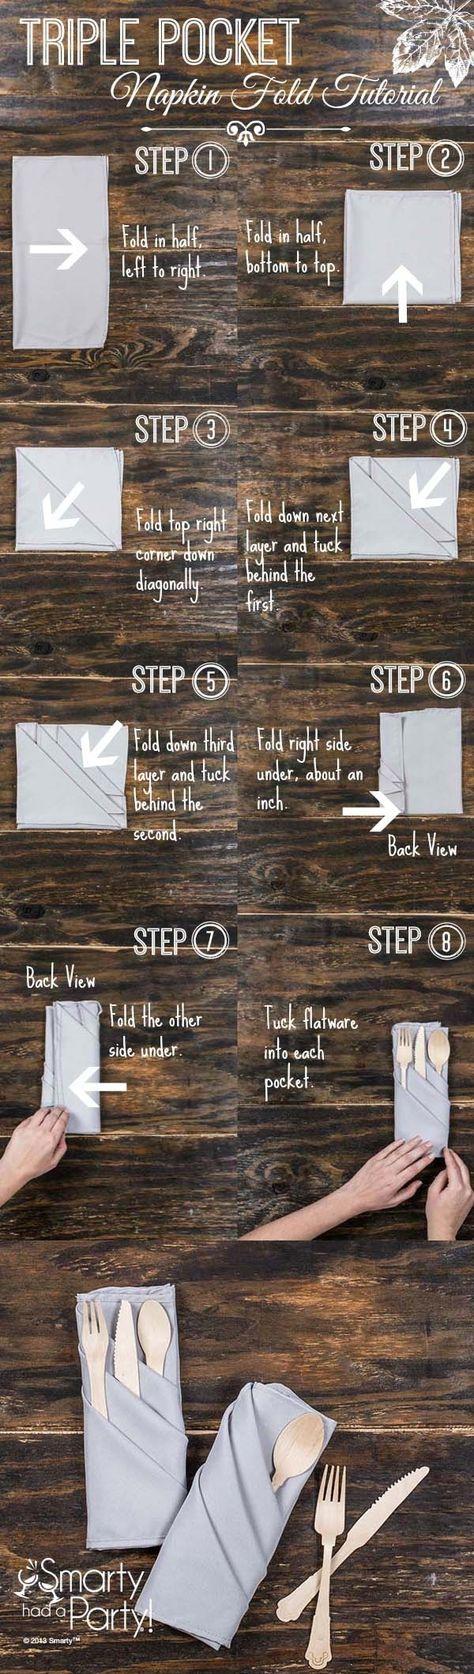 Triple Pocket Napkin Fold Tutorial #SmartyHadAParty